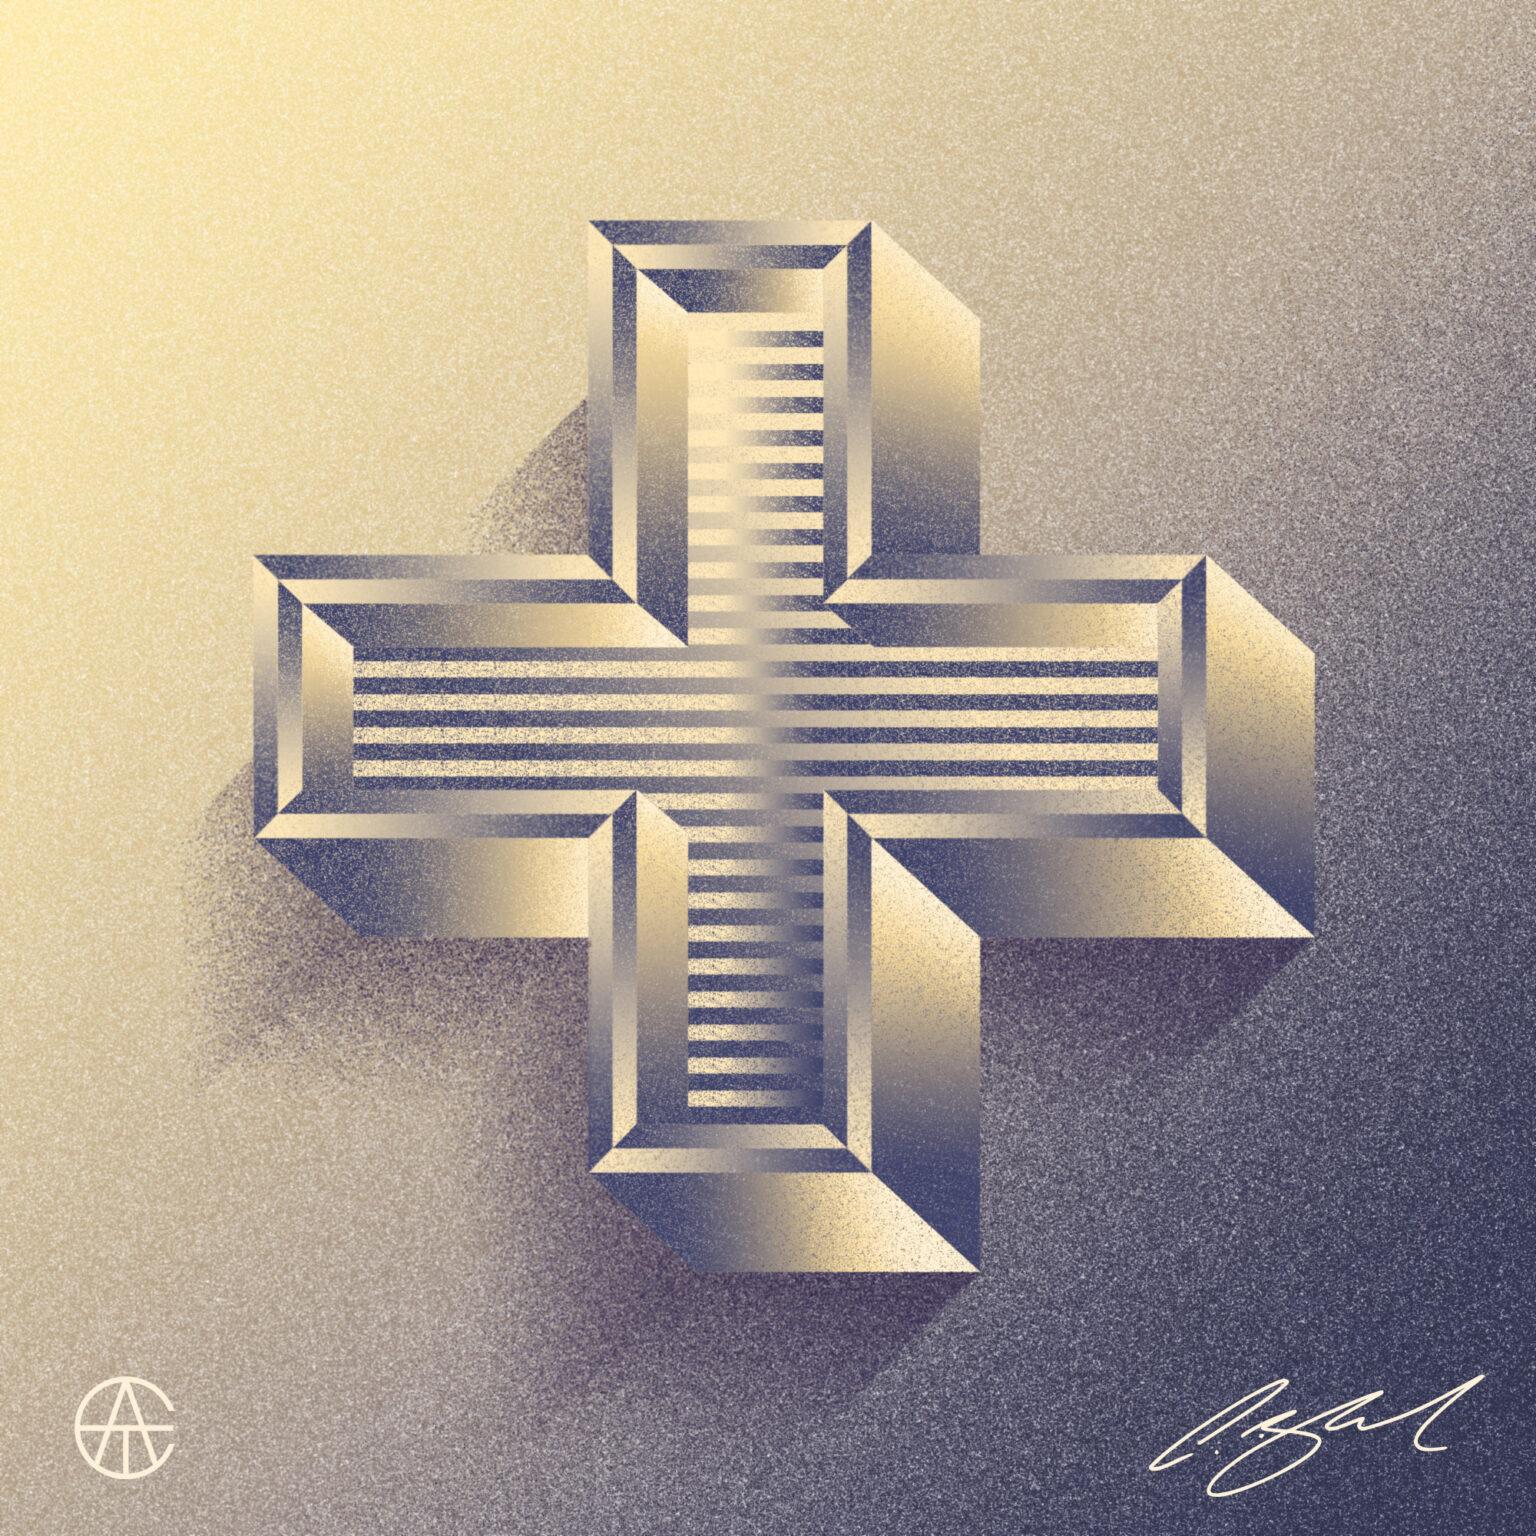 ATC Artist Series Craig Black Letter Symbols